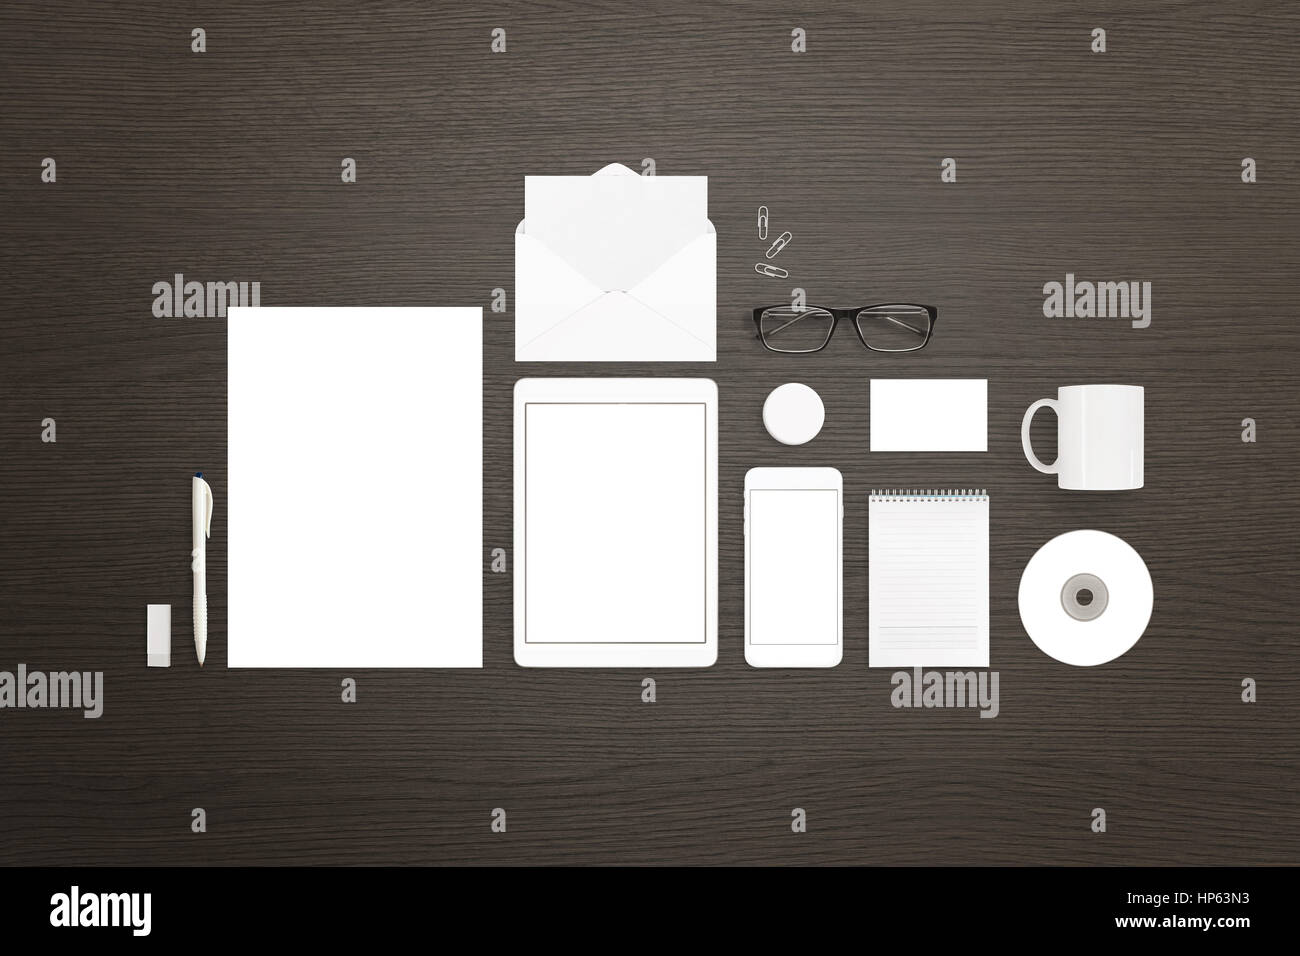 Papier Tablette Tlphone Intelligent Stylo Tasse Enveloppe Carte De Visite Badge Pin Cd Pad G